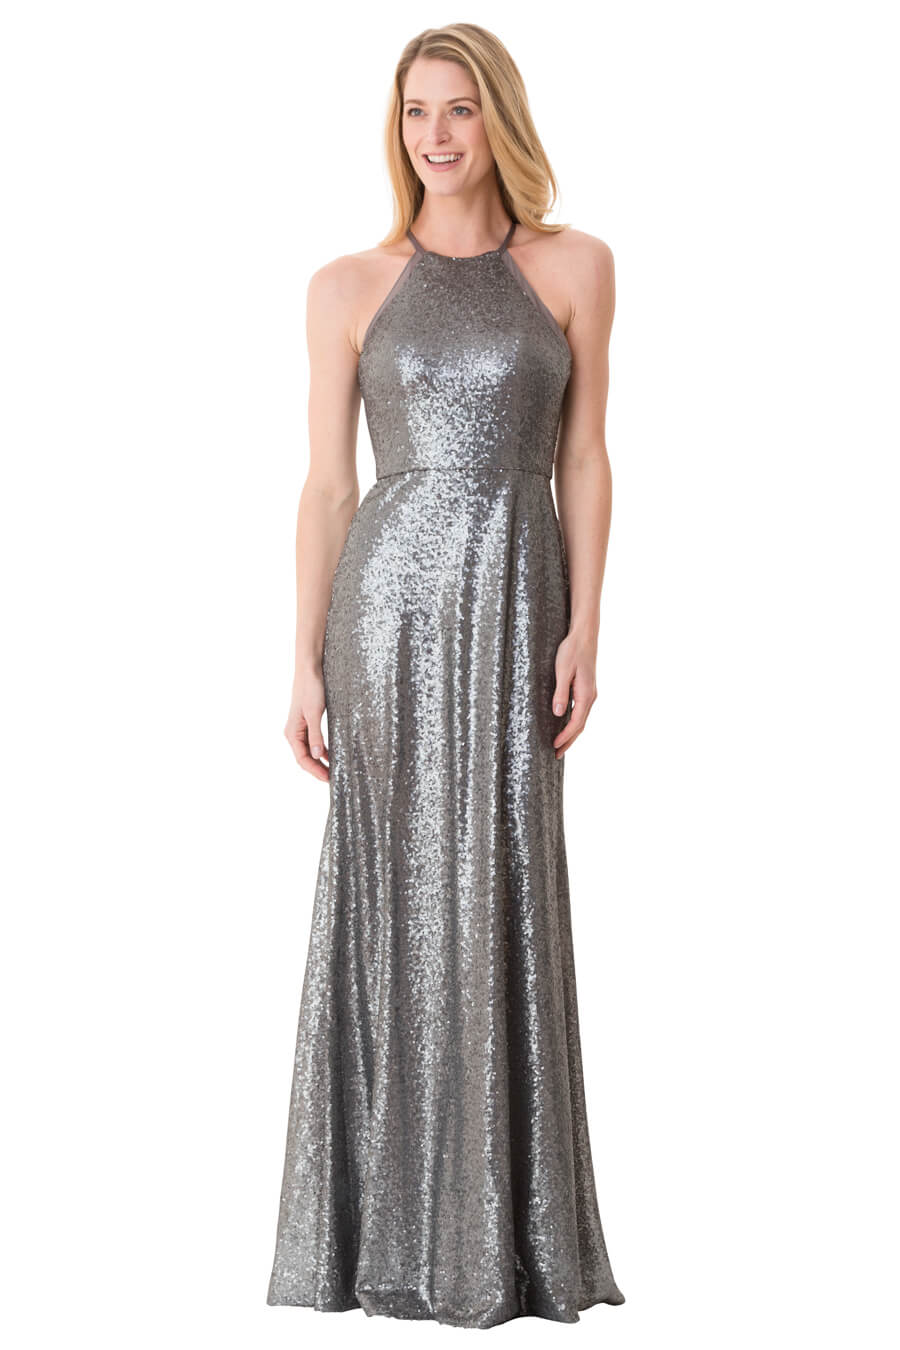 Bari Jay Bridesmaids | Bridesmaid Dresses, Prom Dresses & Formal ...